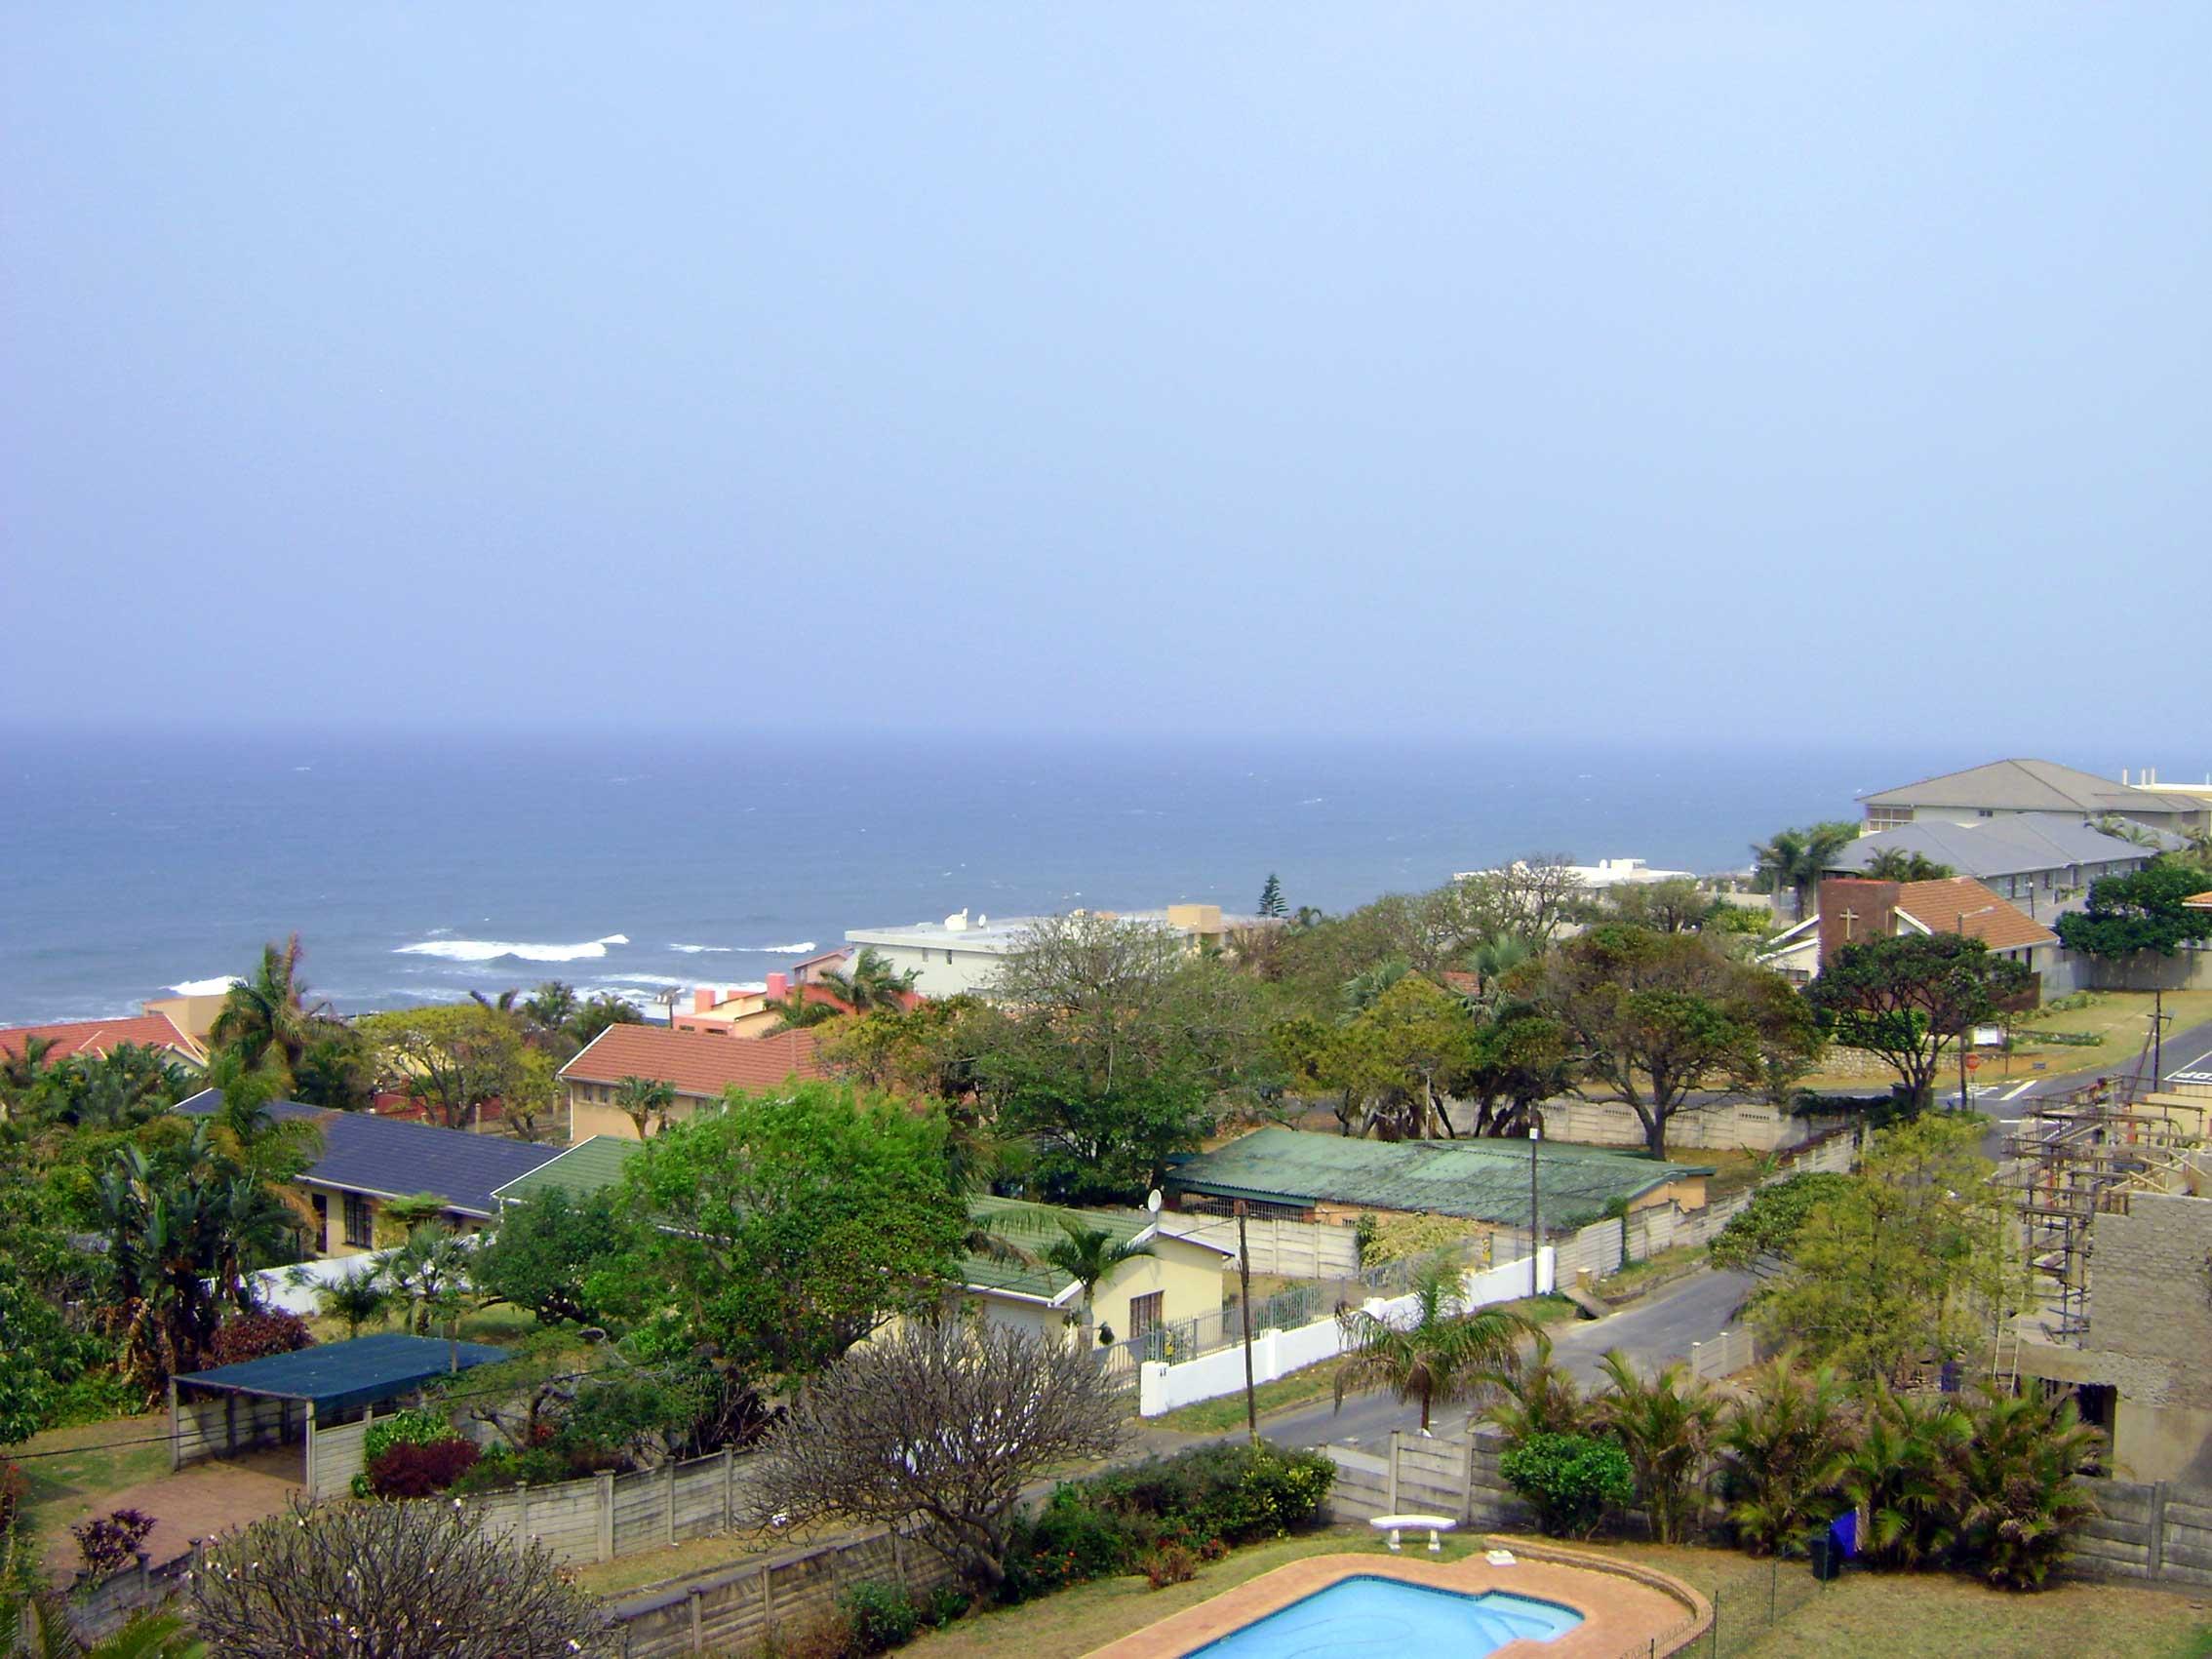 Bonamic 13 - Manaba Beach - Self Catering - Accommodation - Sleeps 6